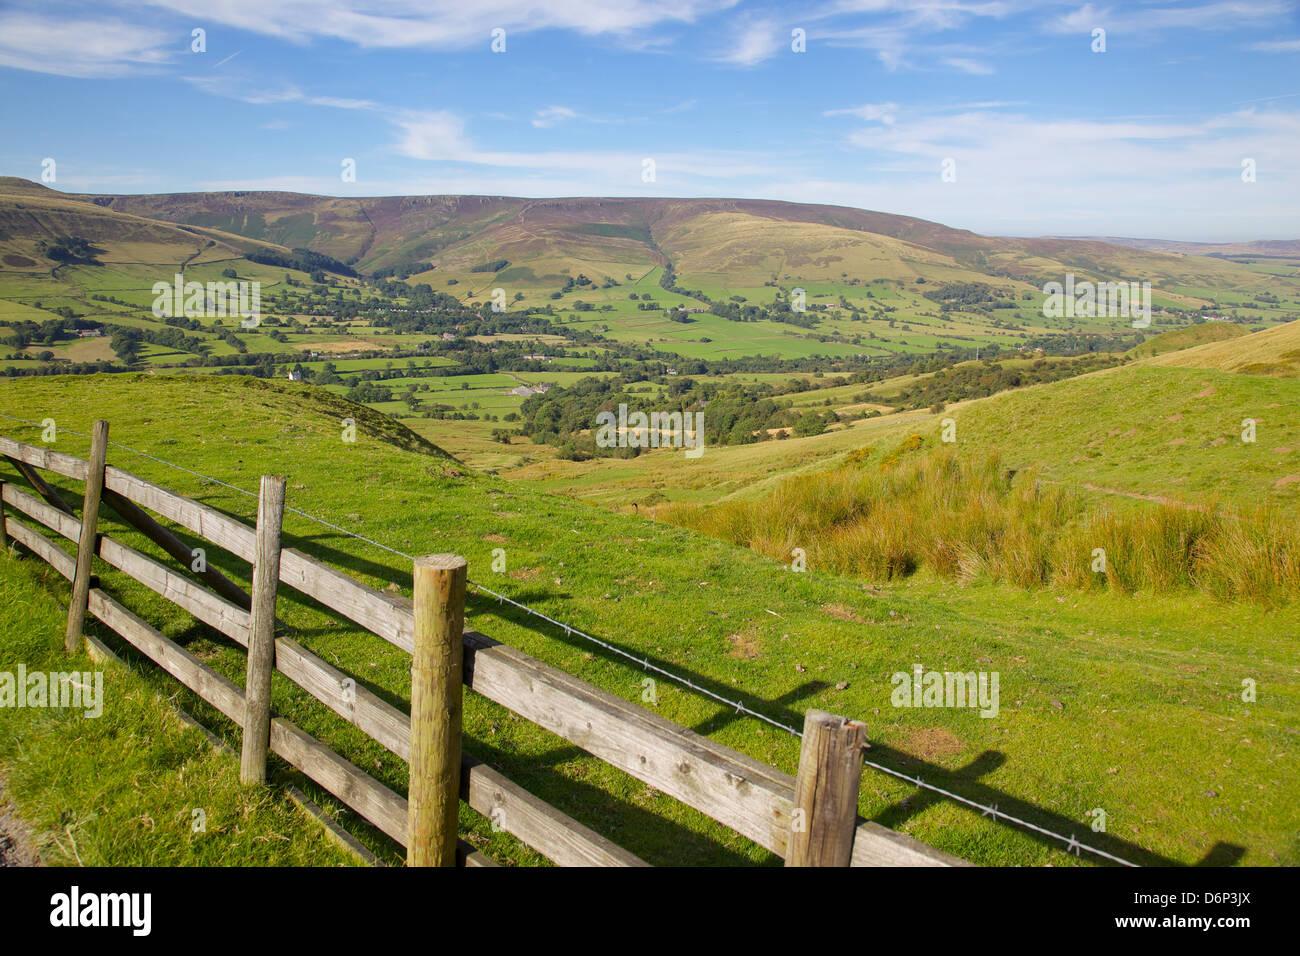 Vale of Edale, Peak District National Park, Derbyshire, England, United Kingdom, Europe - Stock Image